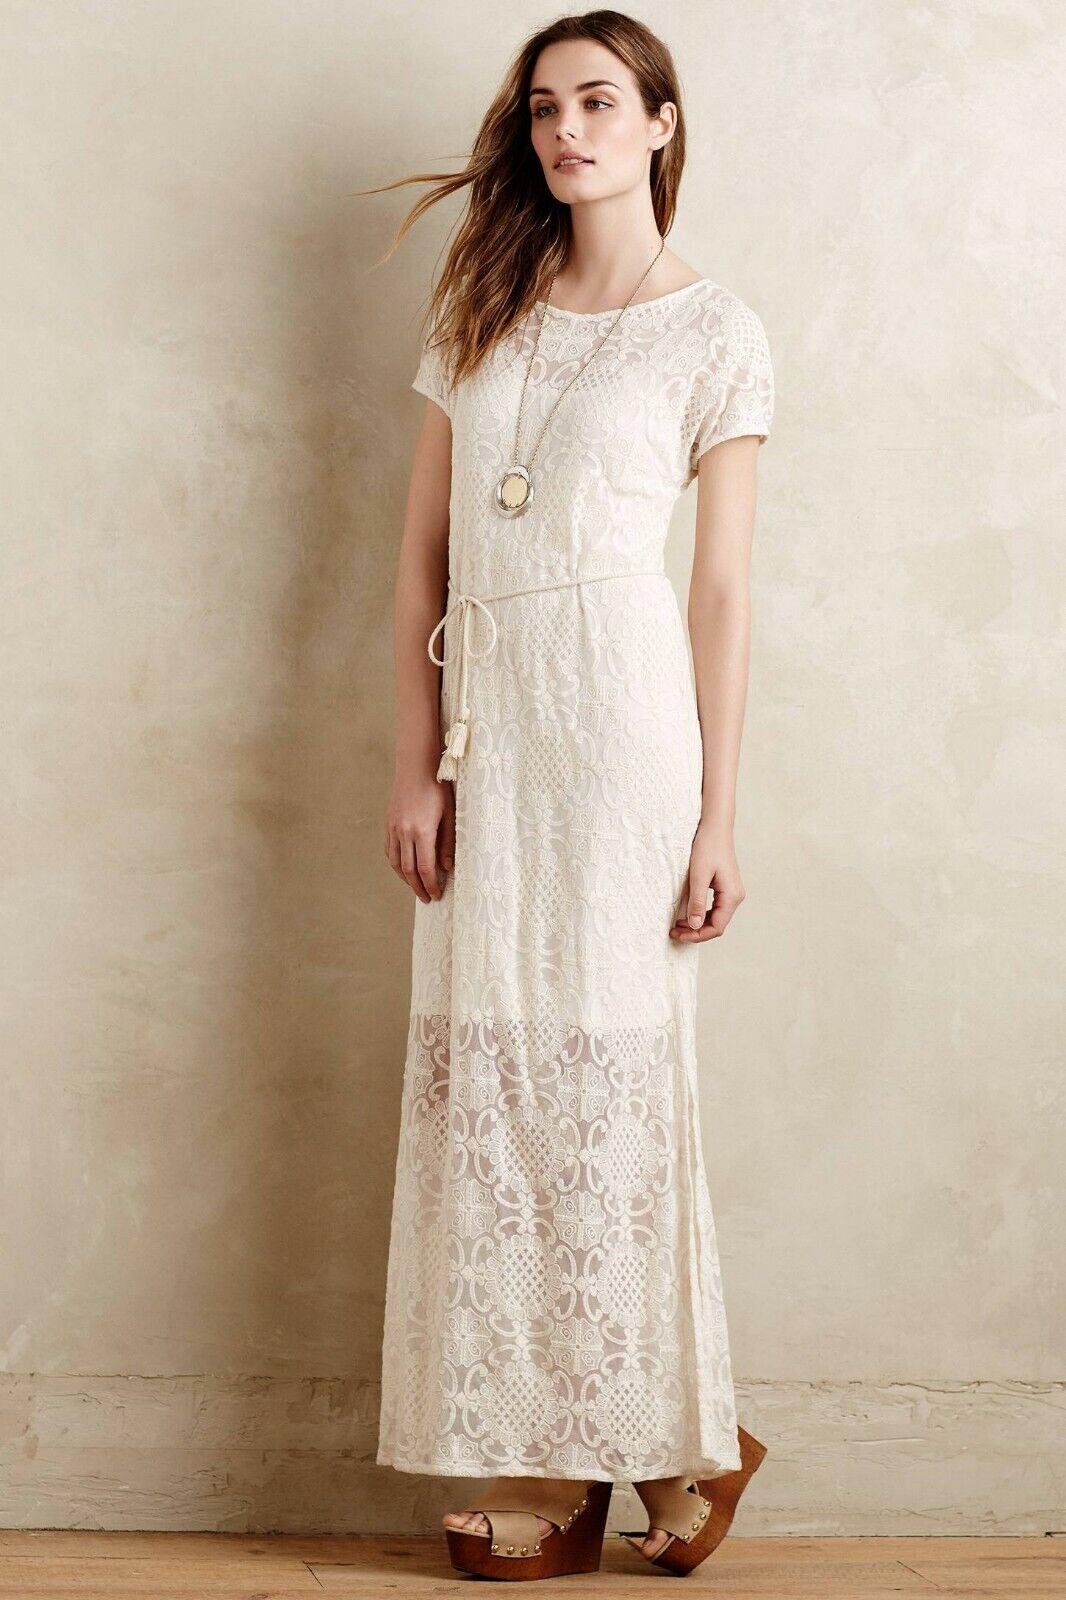 NEW Anthropologie Lilka Bellflower Lace Dress, Größe M, Cream Lace Maxi, Was